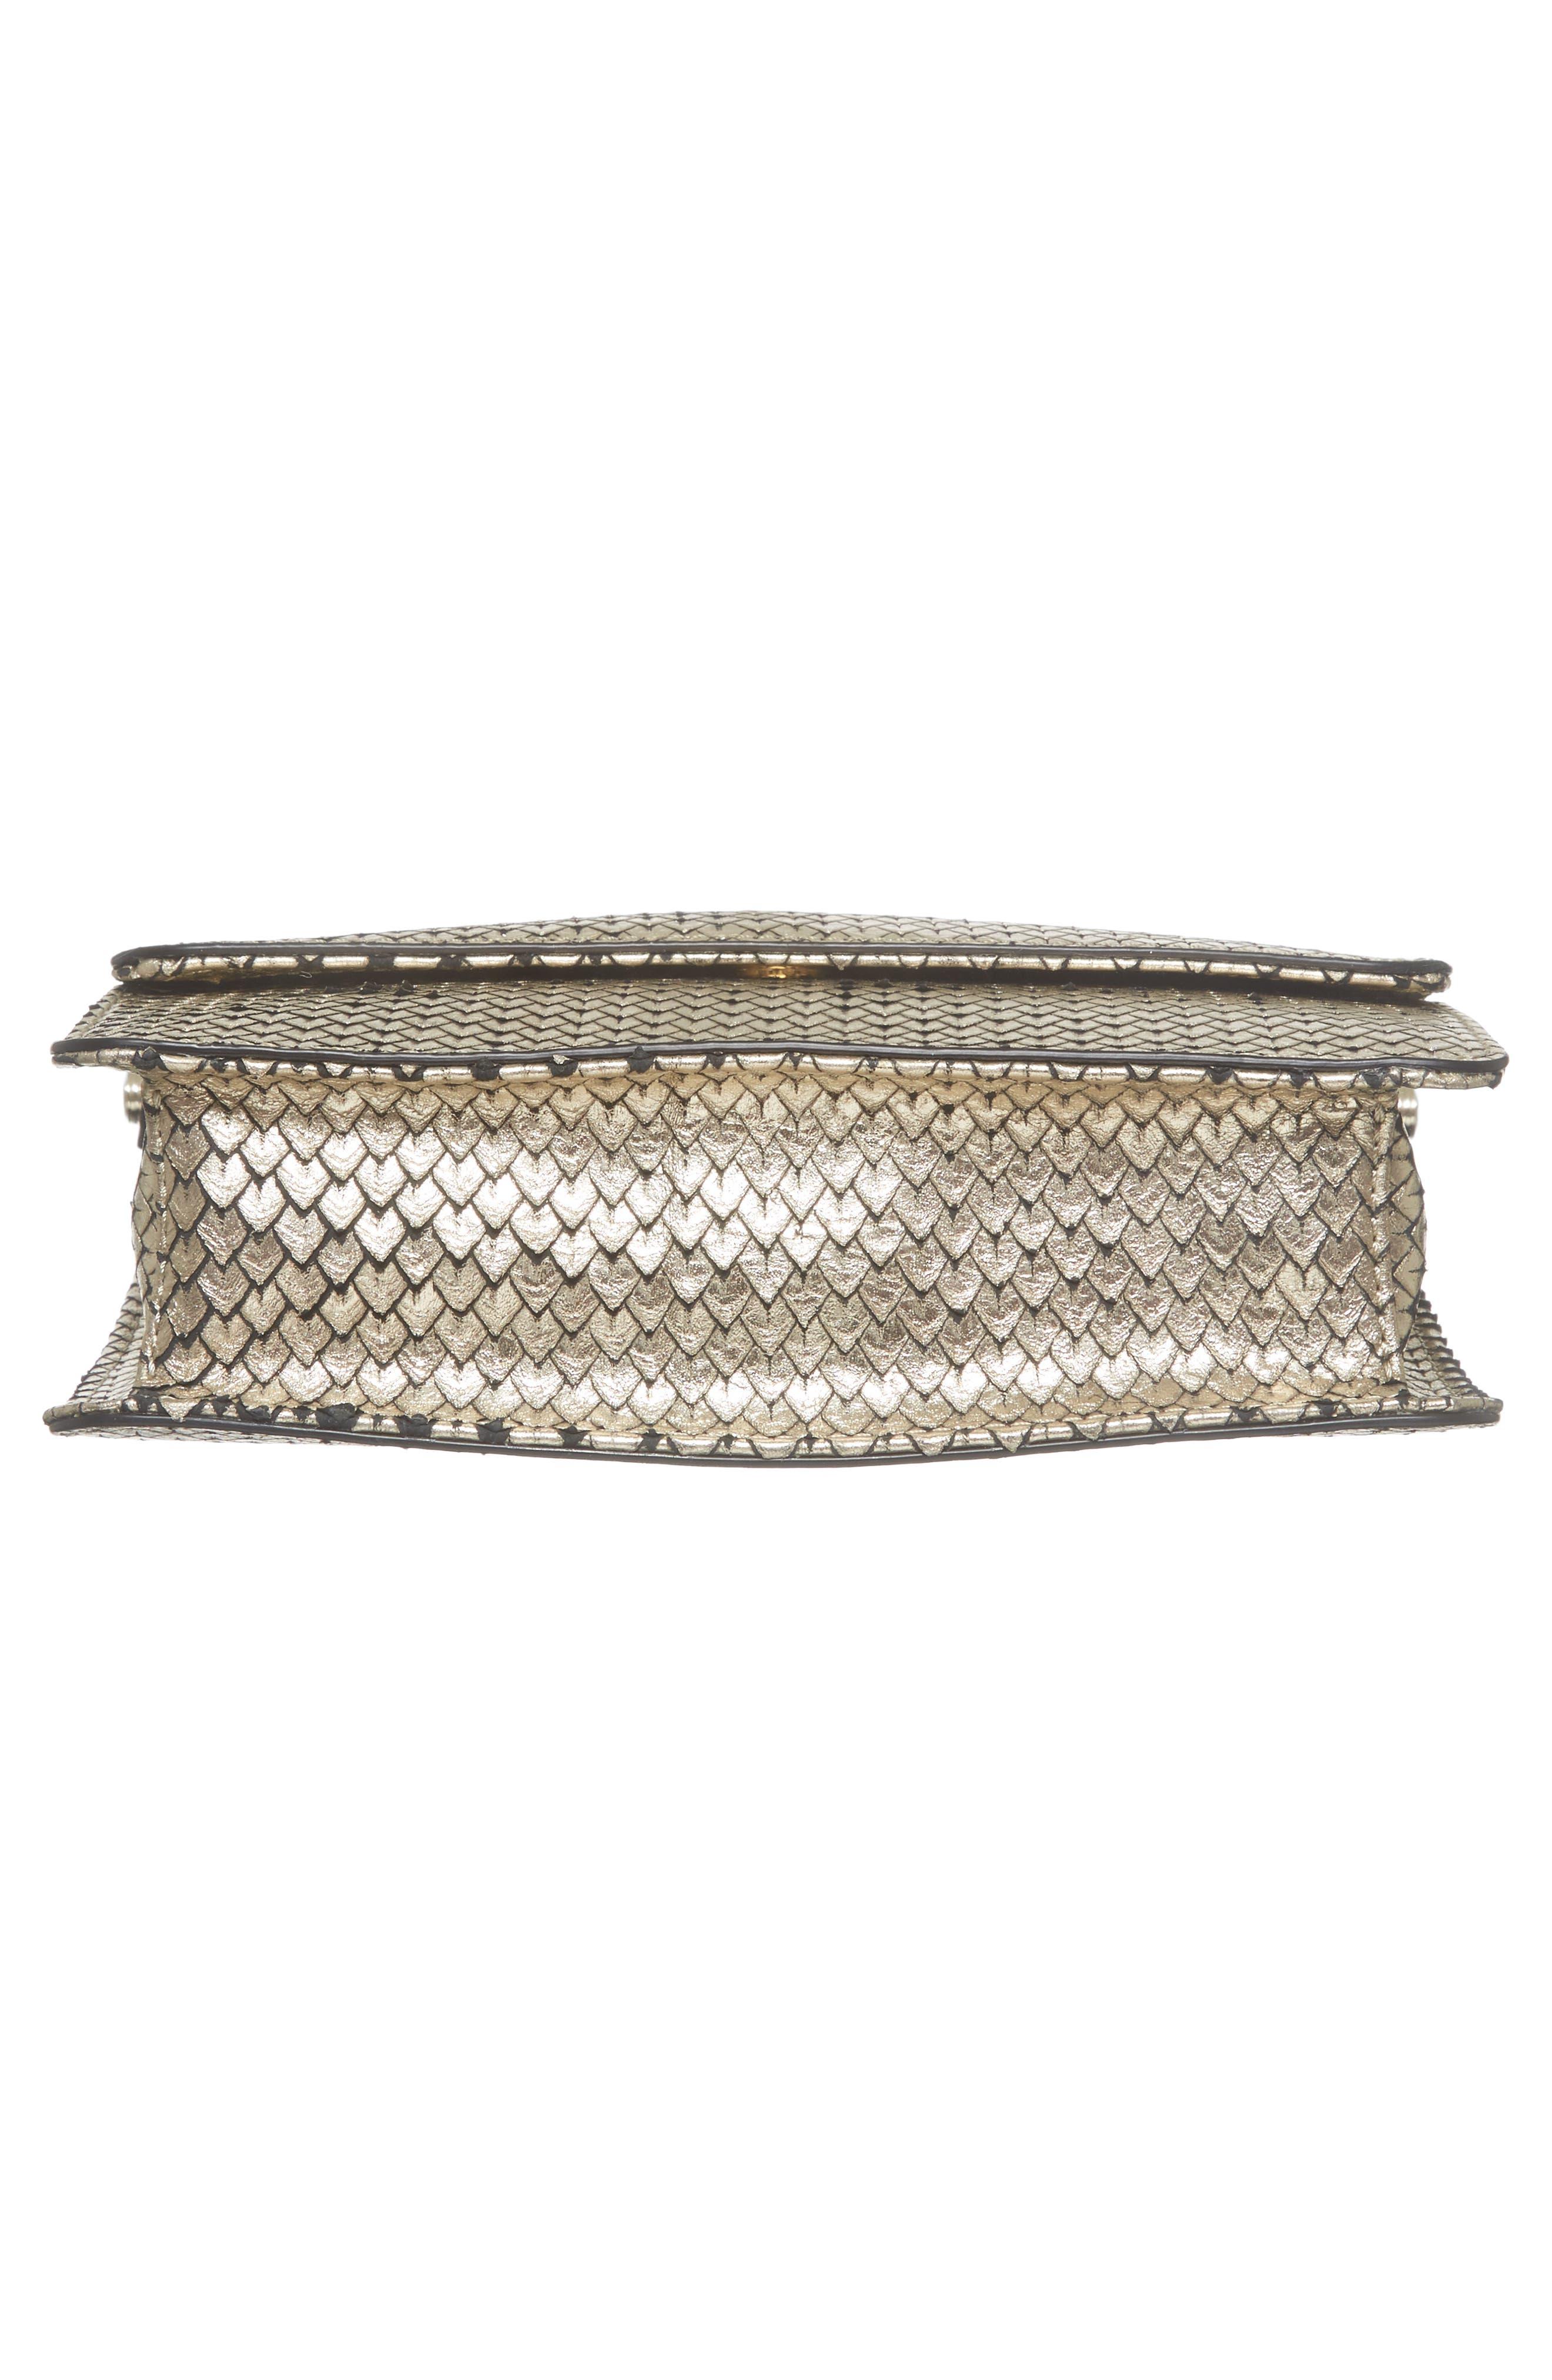 Crawford Calfskin Leather Crossbody Bag,                             Alternate thumbnail 6, color,                             Gold